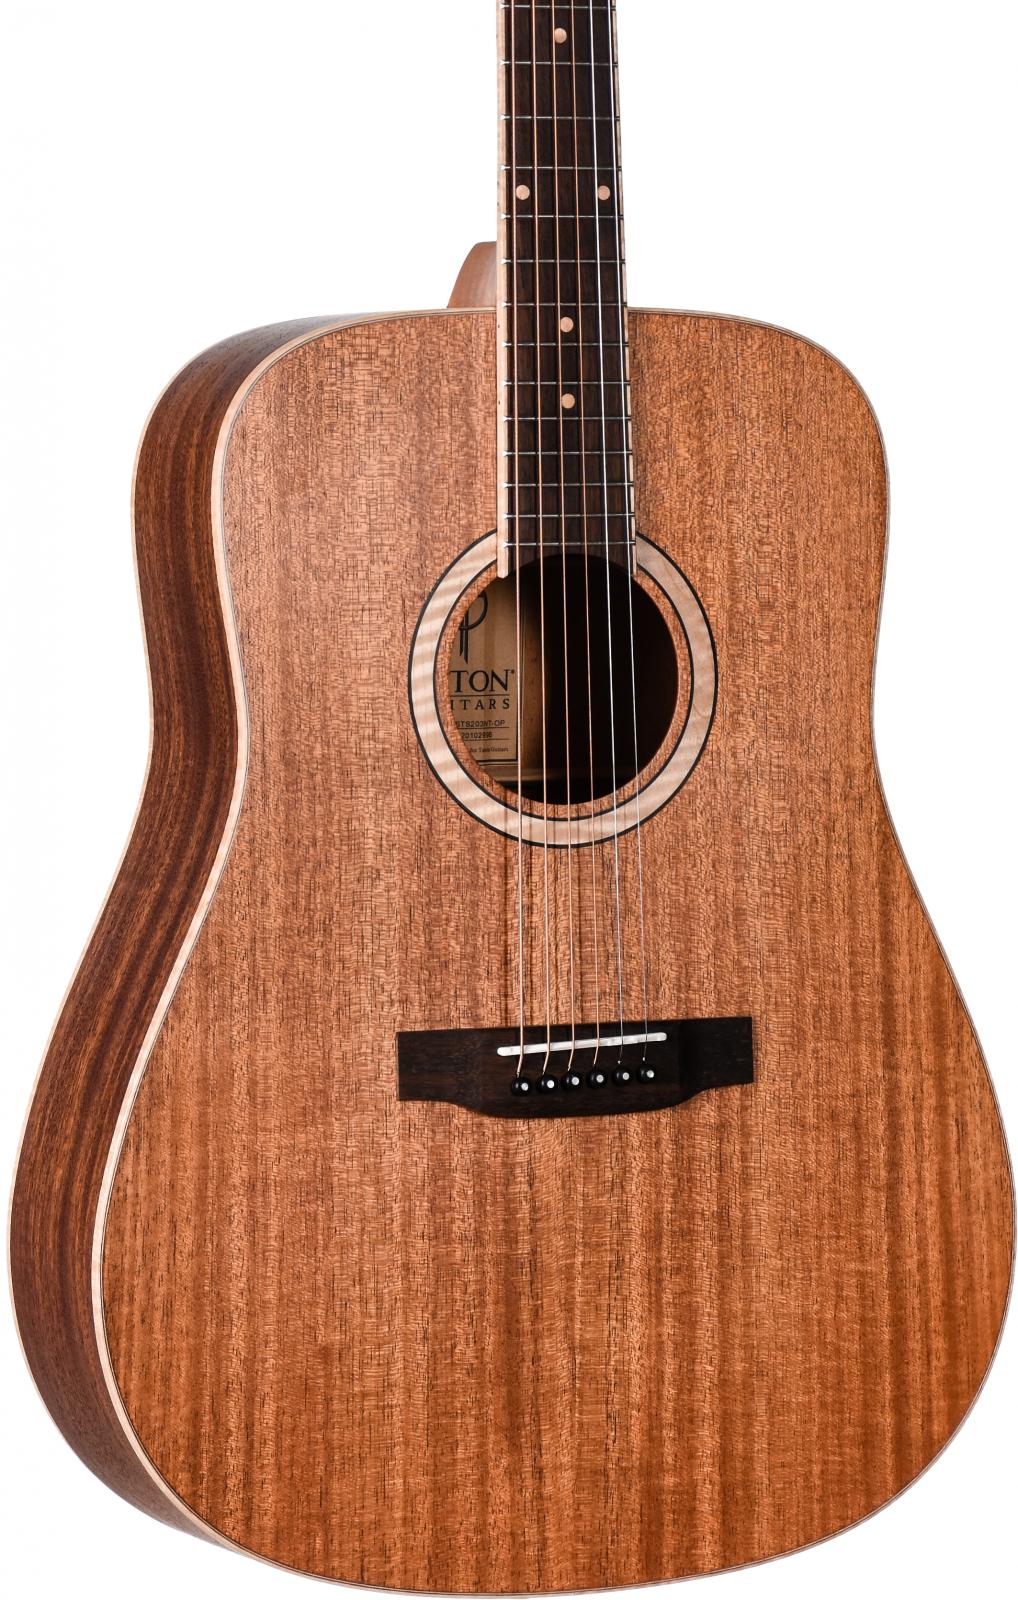 Teton STS203NT-OP All Solid Mahogany Acoustic